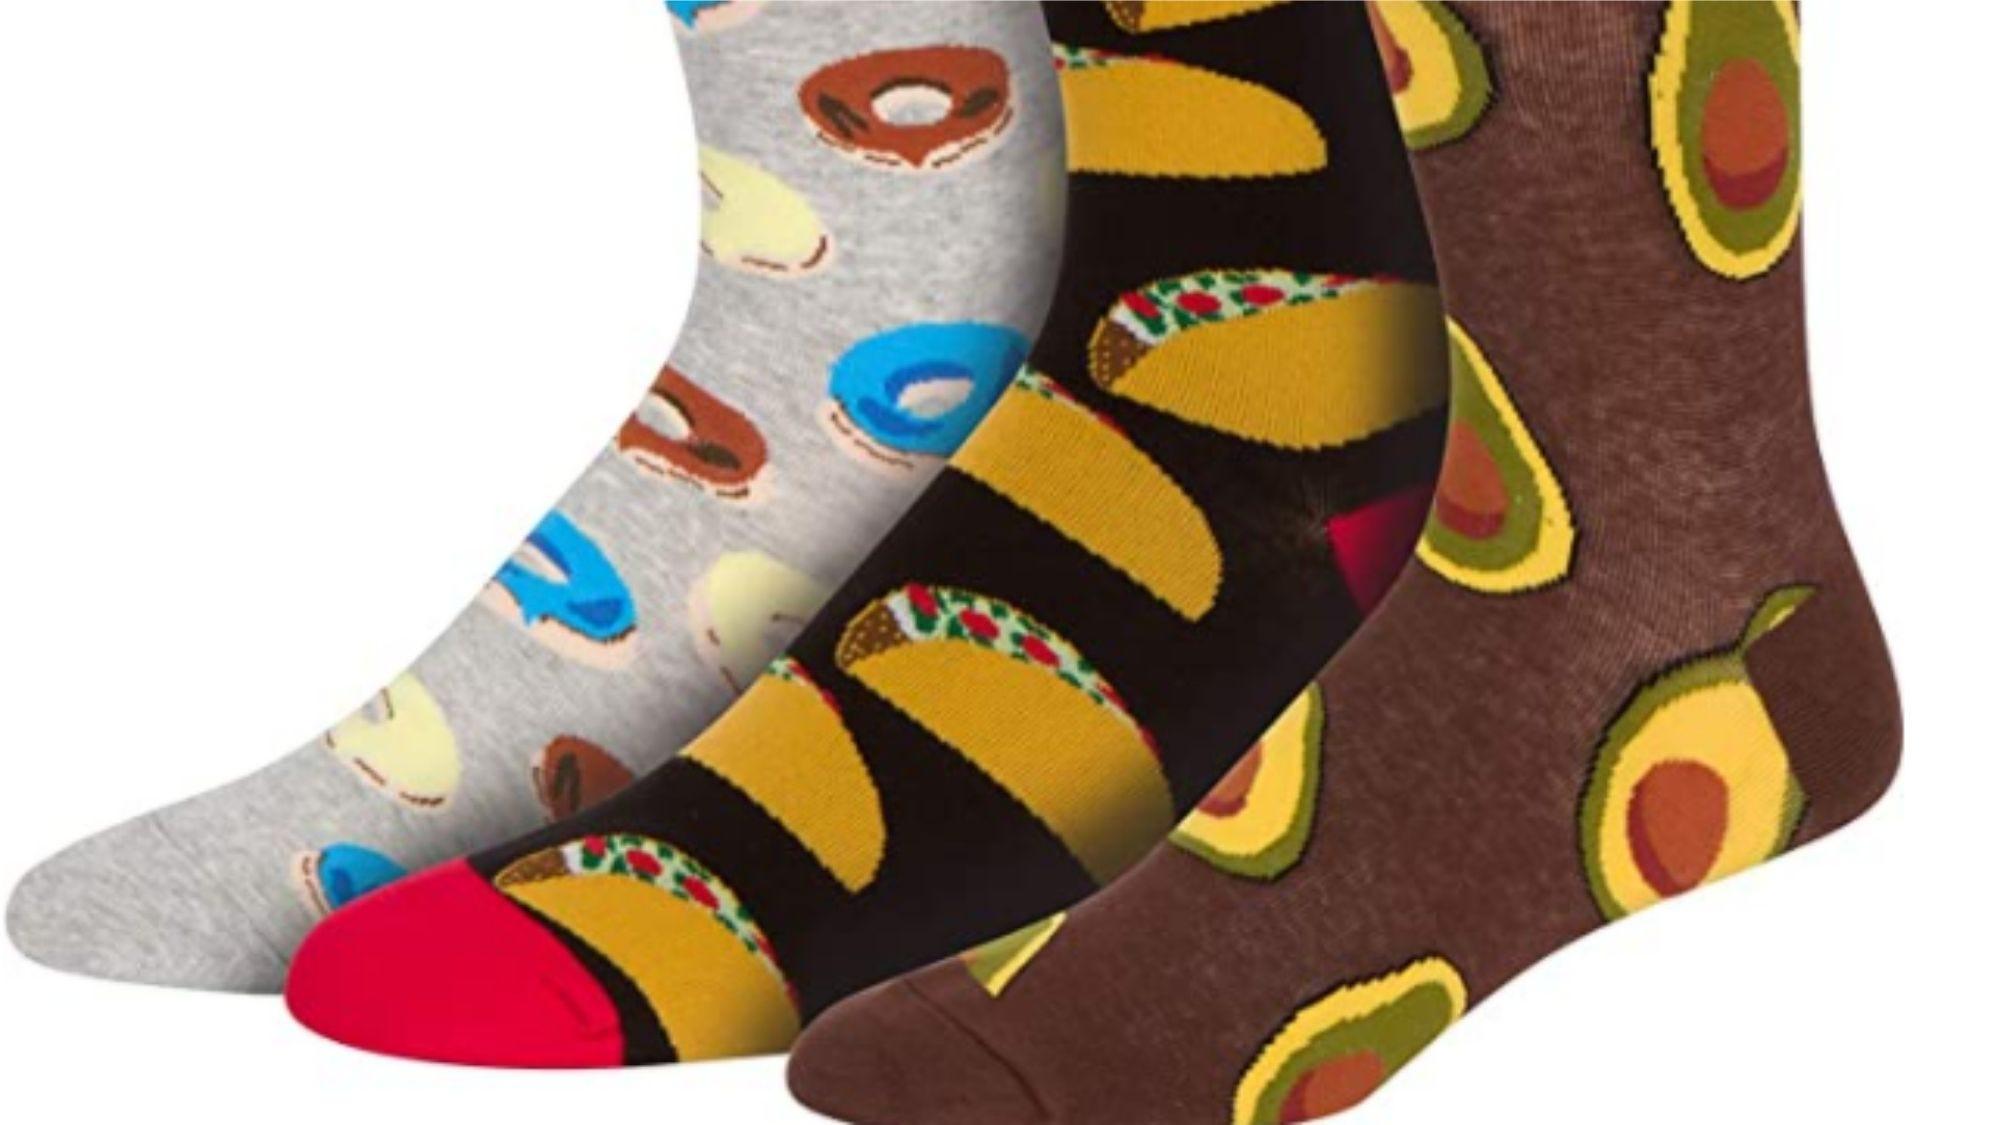 Fun adult socks with food designs on them